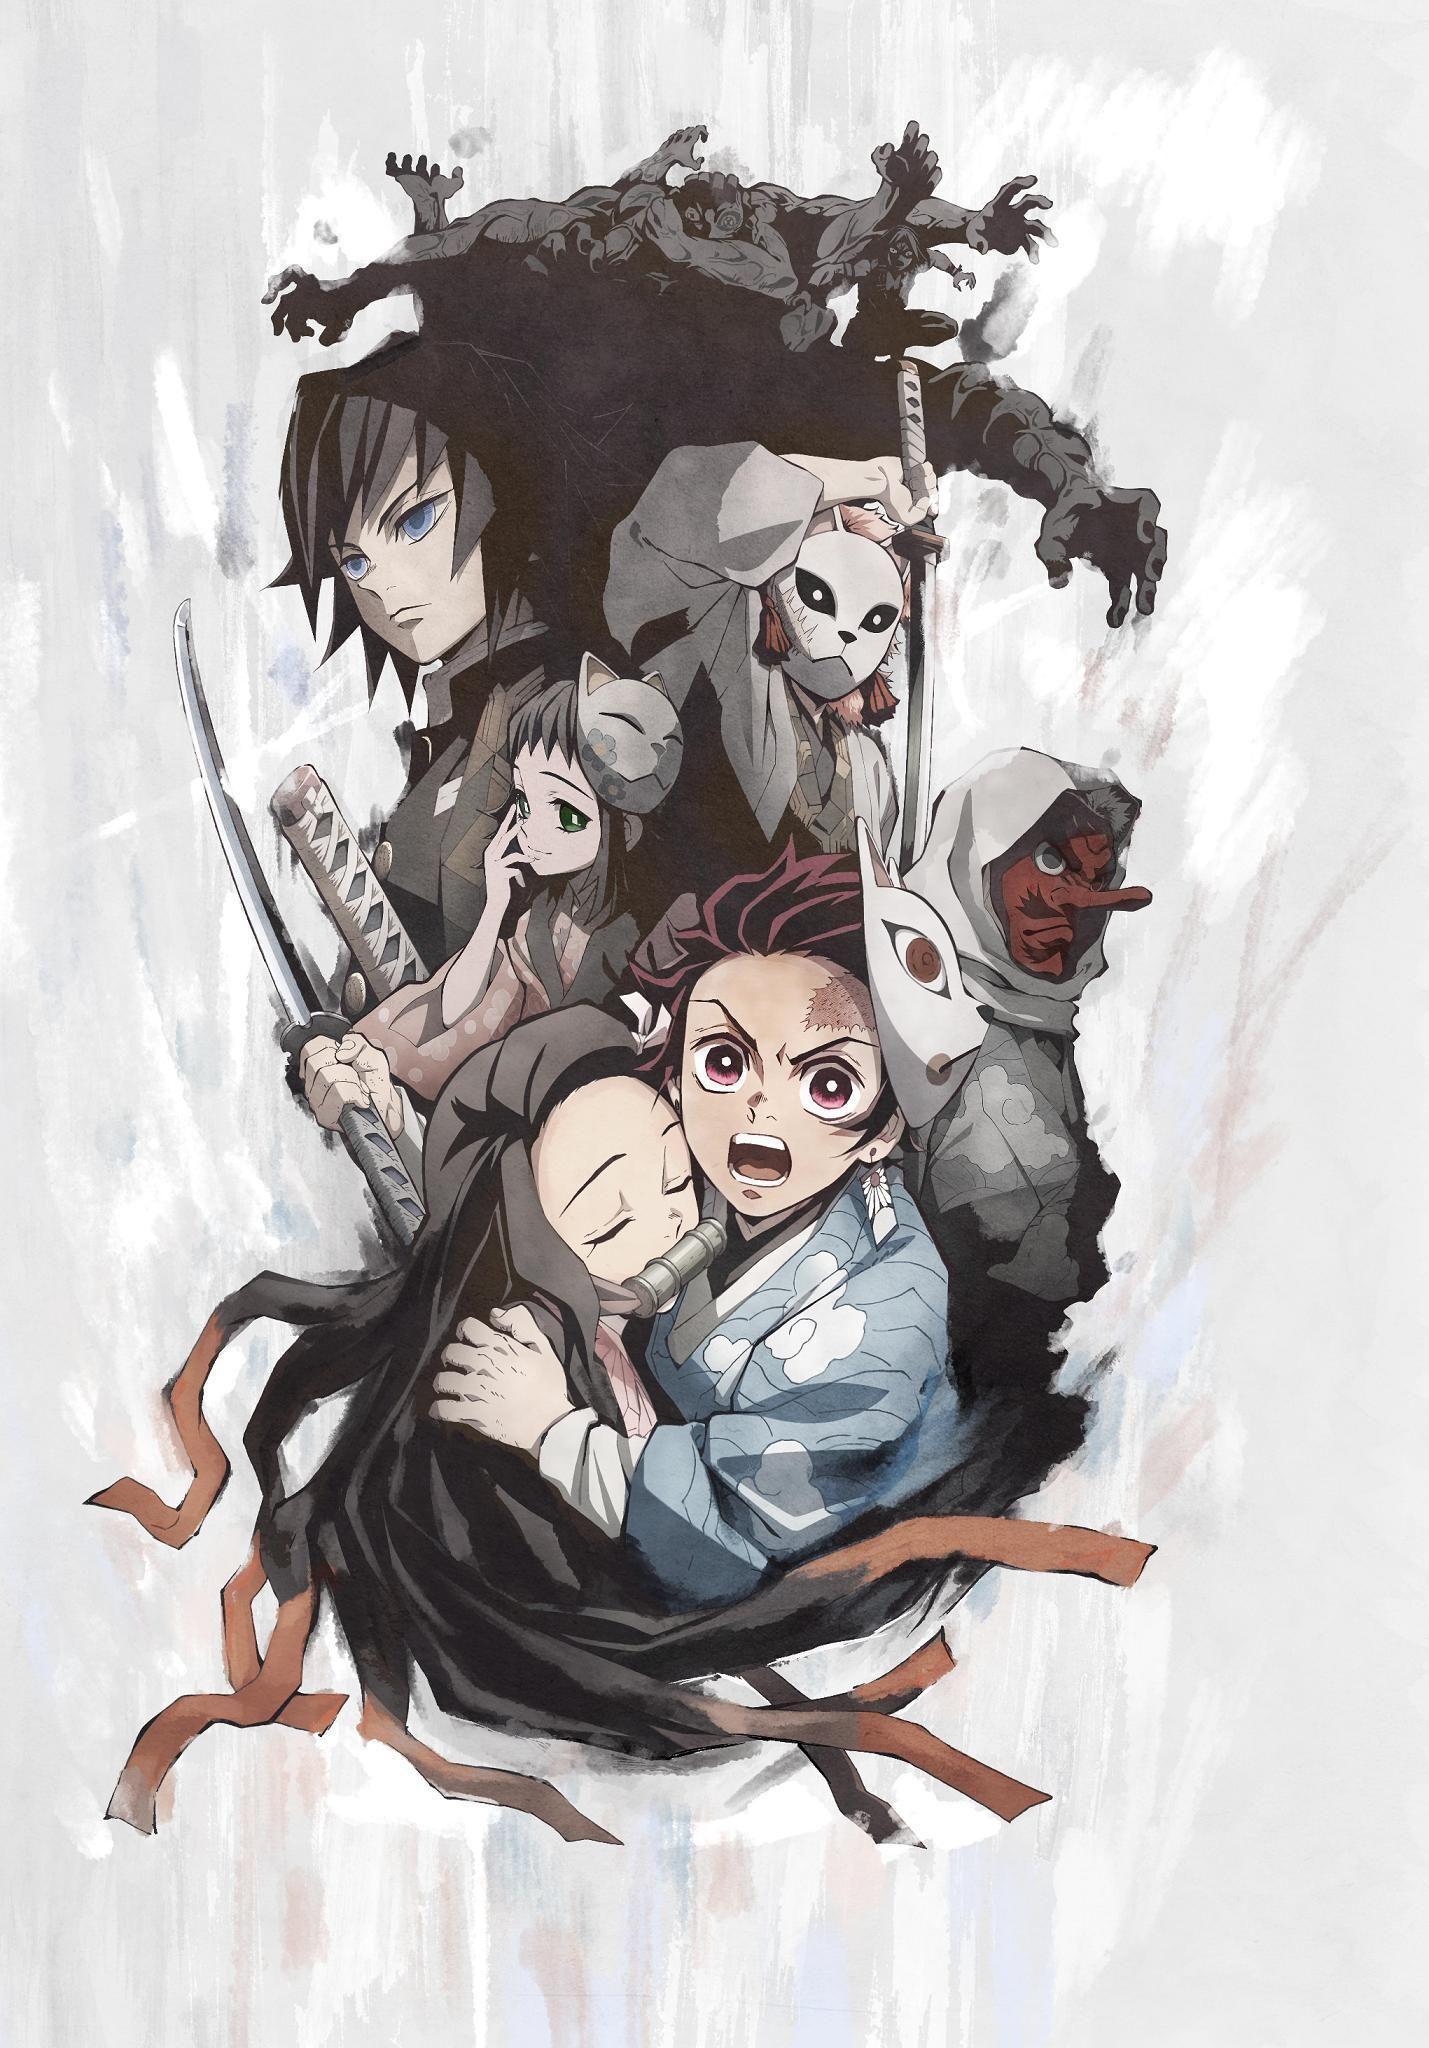 Kimetsu no Yaiba wallpaper Anime demon, Anime images, L